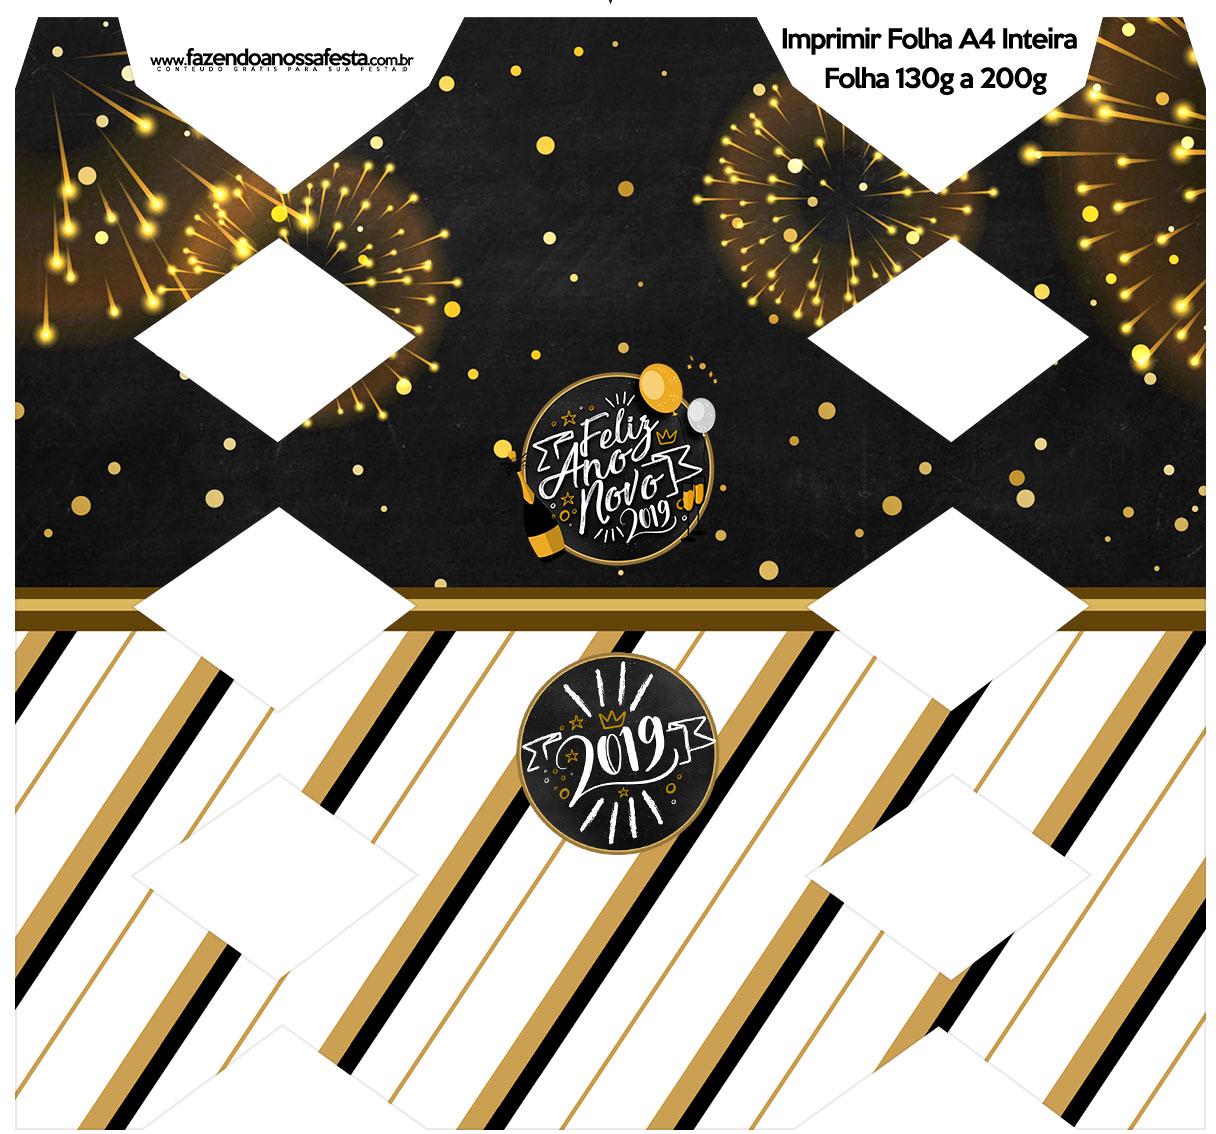 Caixa Bala Ano Novo 2019